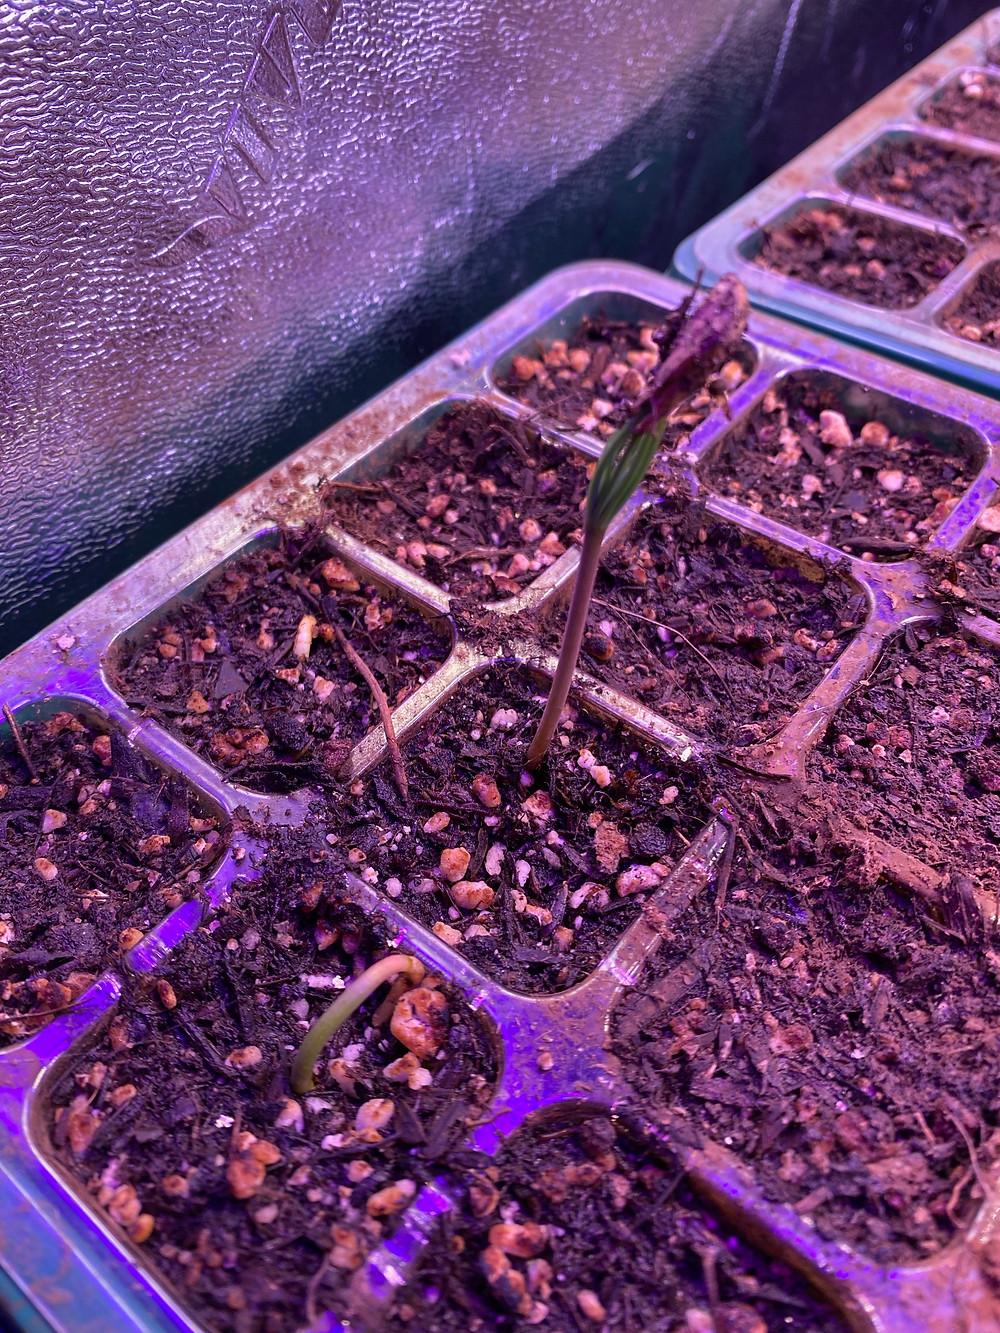 Deodar Cedar seedlings